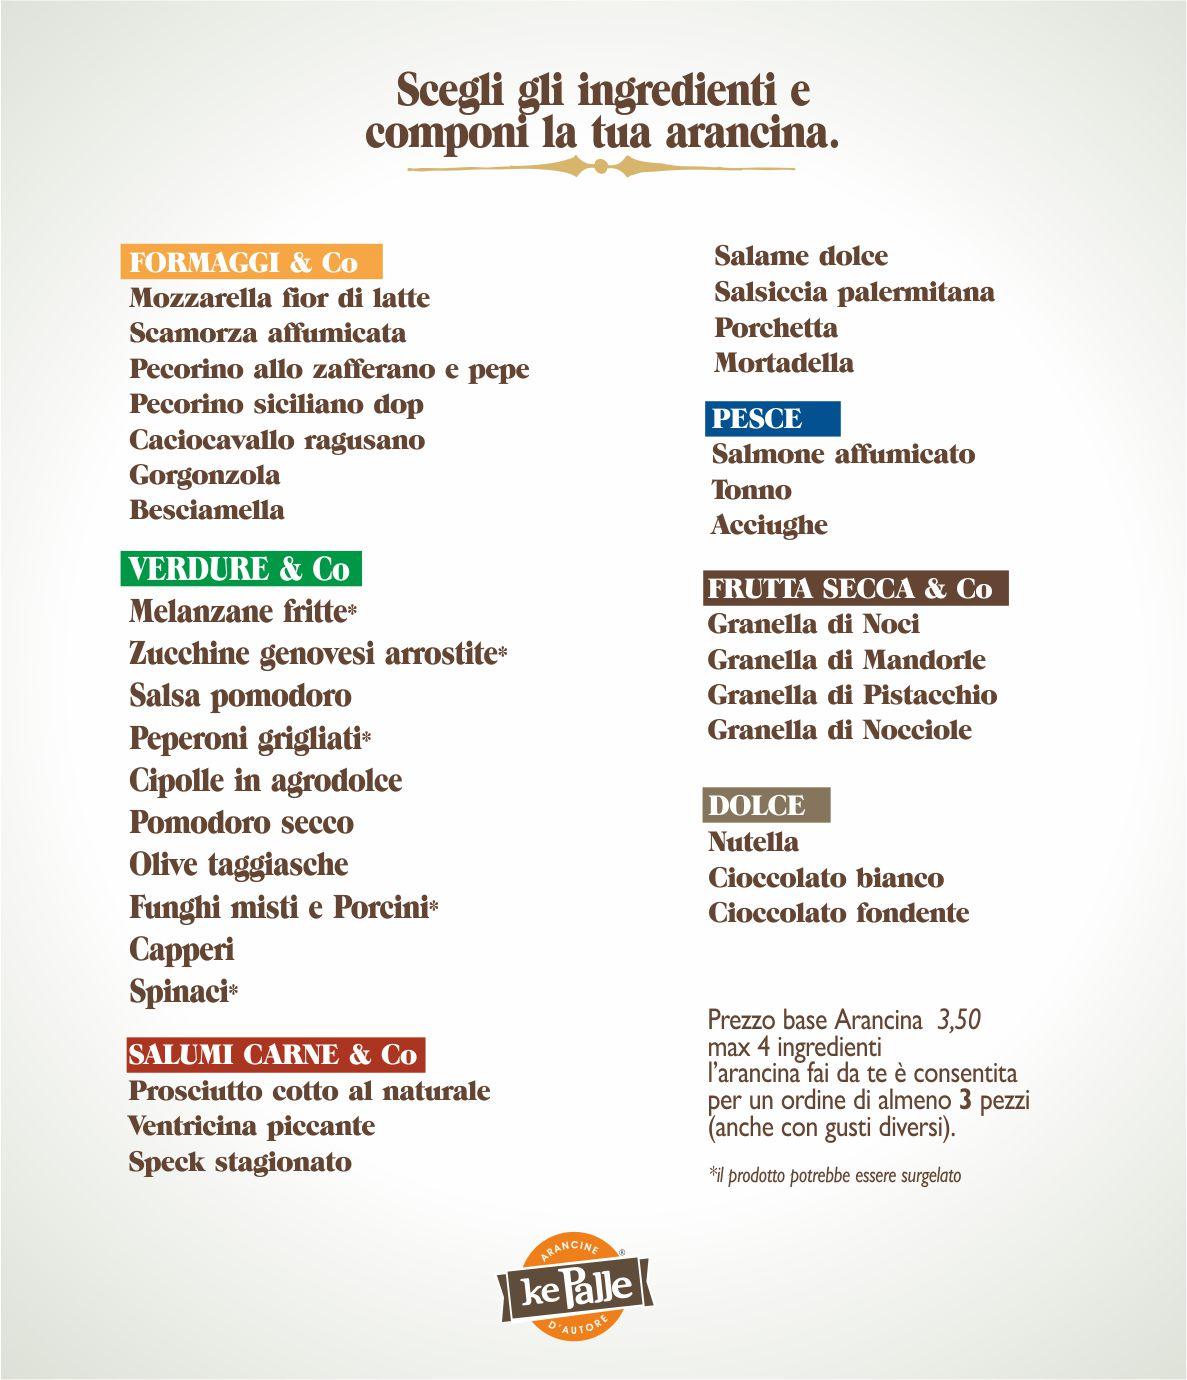 Ingredienti arancina fai da te - Ke Palle